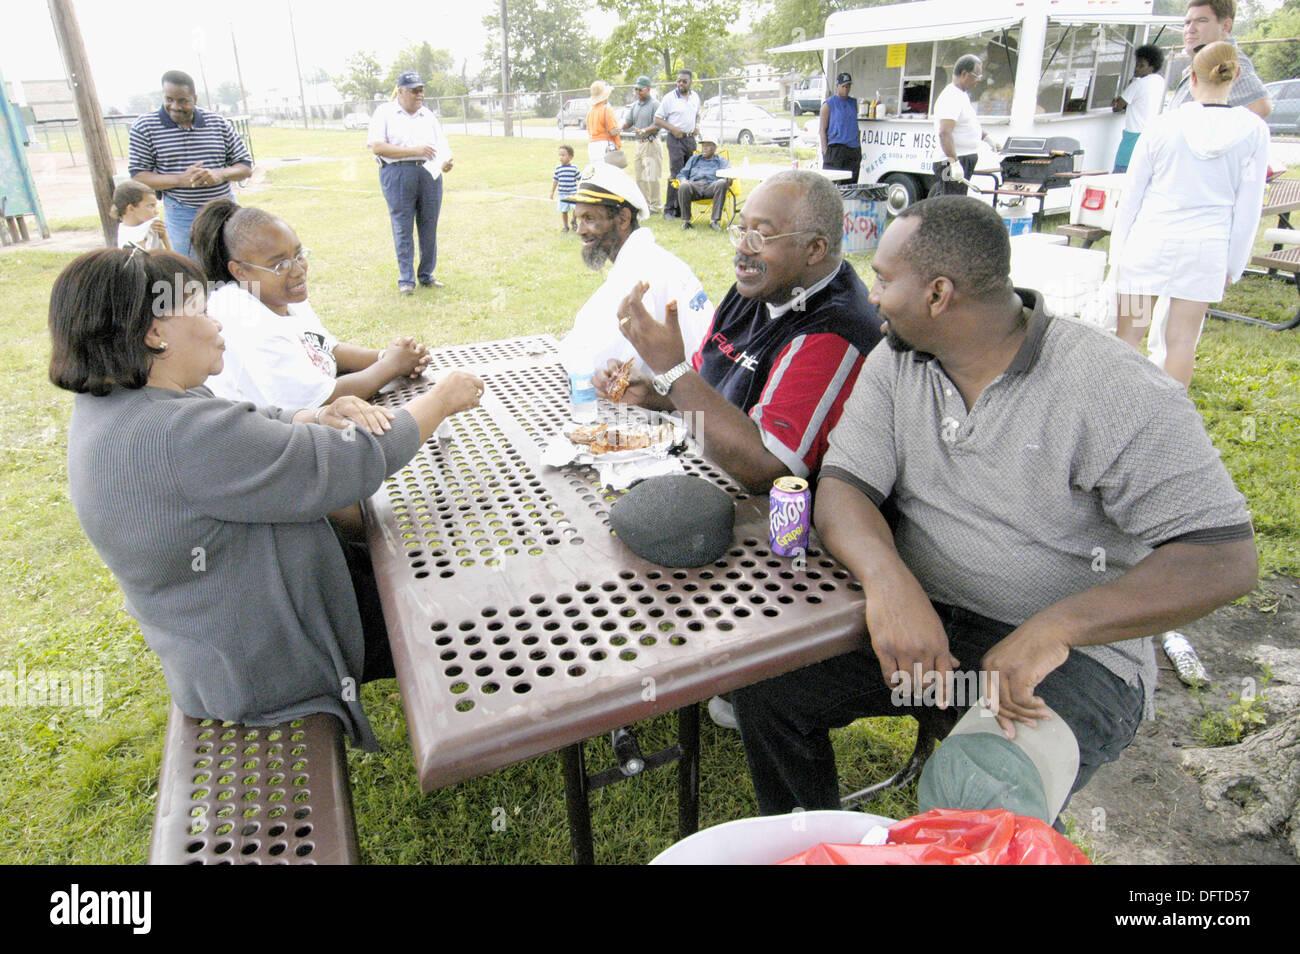 Barbecue at NAACP field day. Port Huron. Michigan, USA - Stock Image